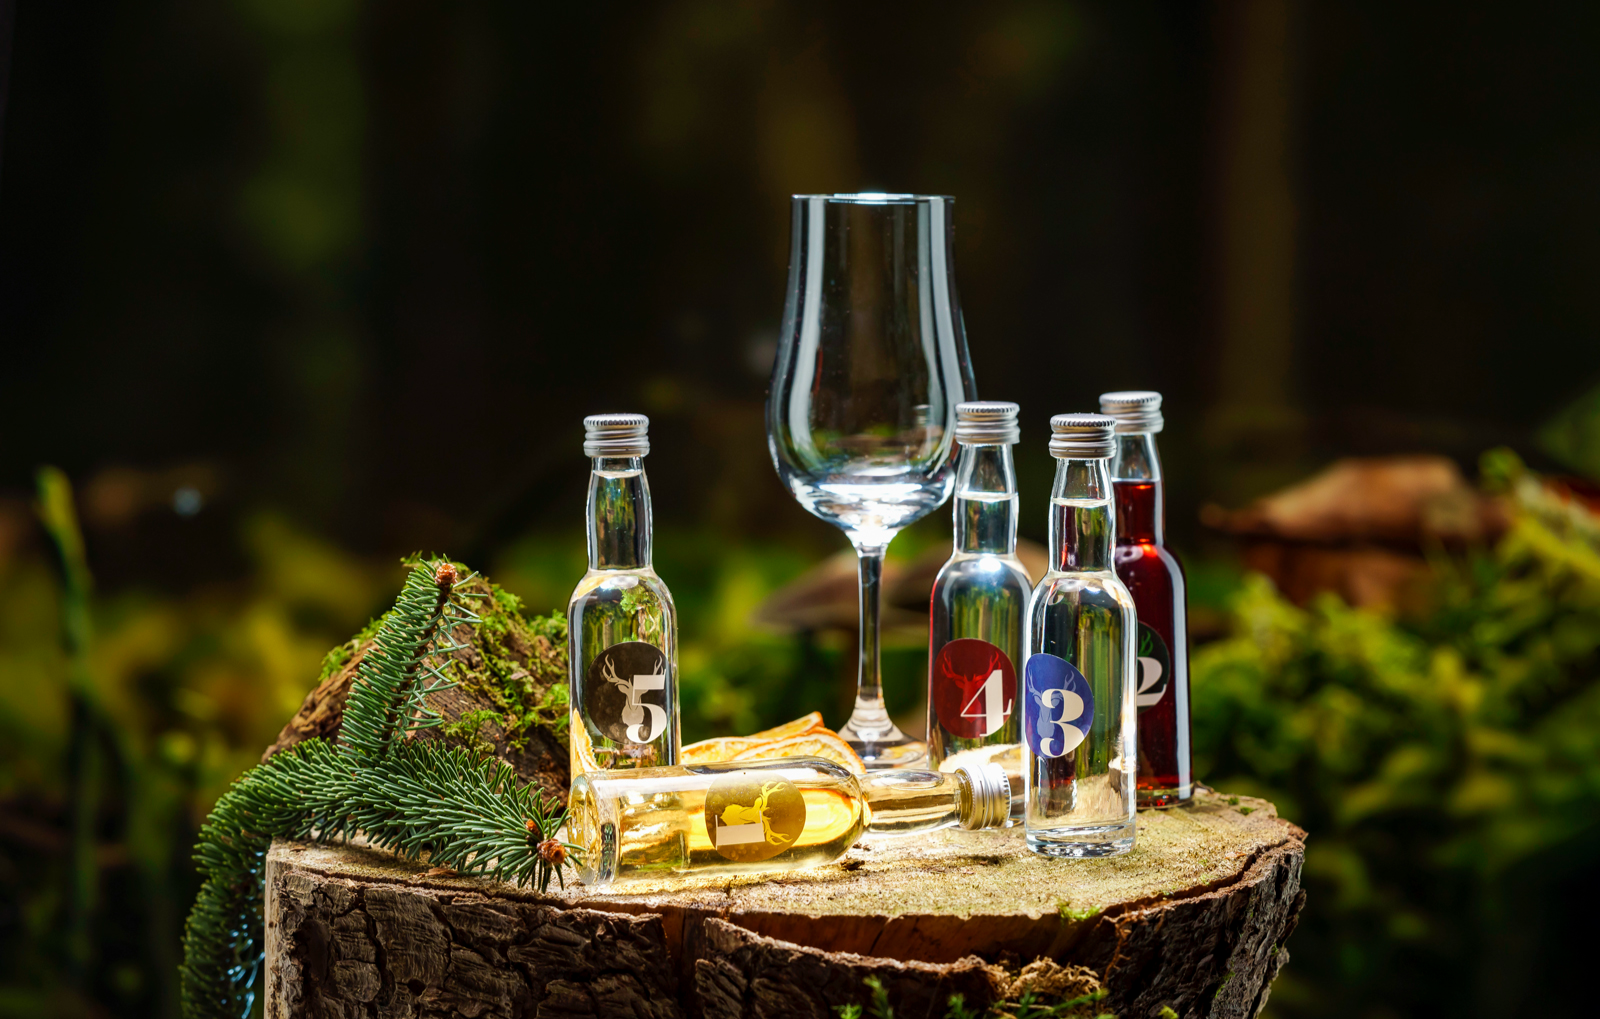 gin-tasting-freiburg-im-breisgau-bg4